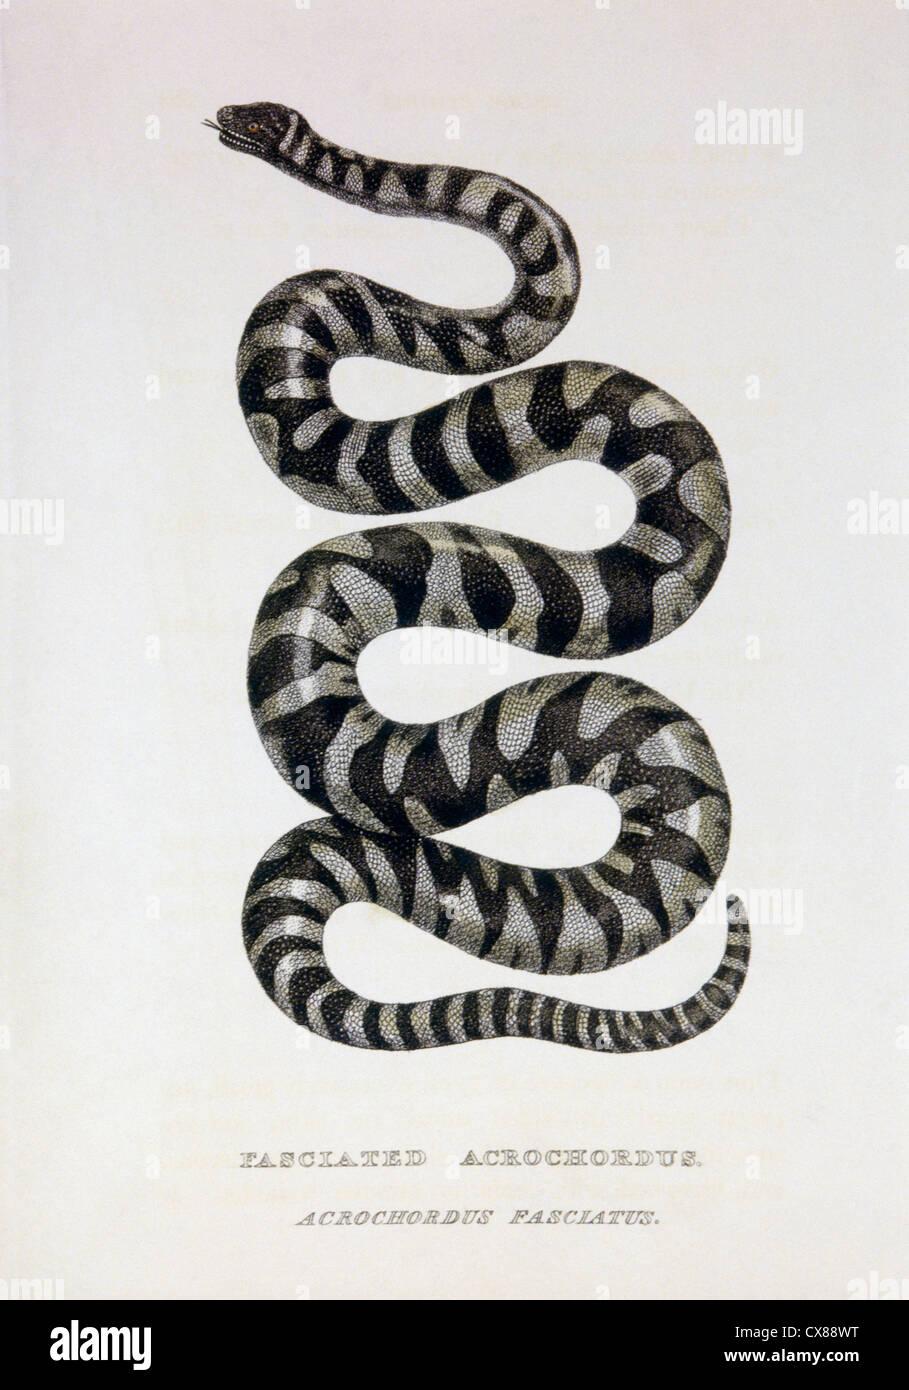 Fasciated Acrochordus (Acrochordus Fasciatus), Hand-Colored Engraving, Circa 1830 - Stock Image